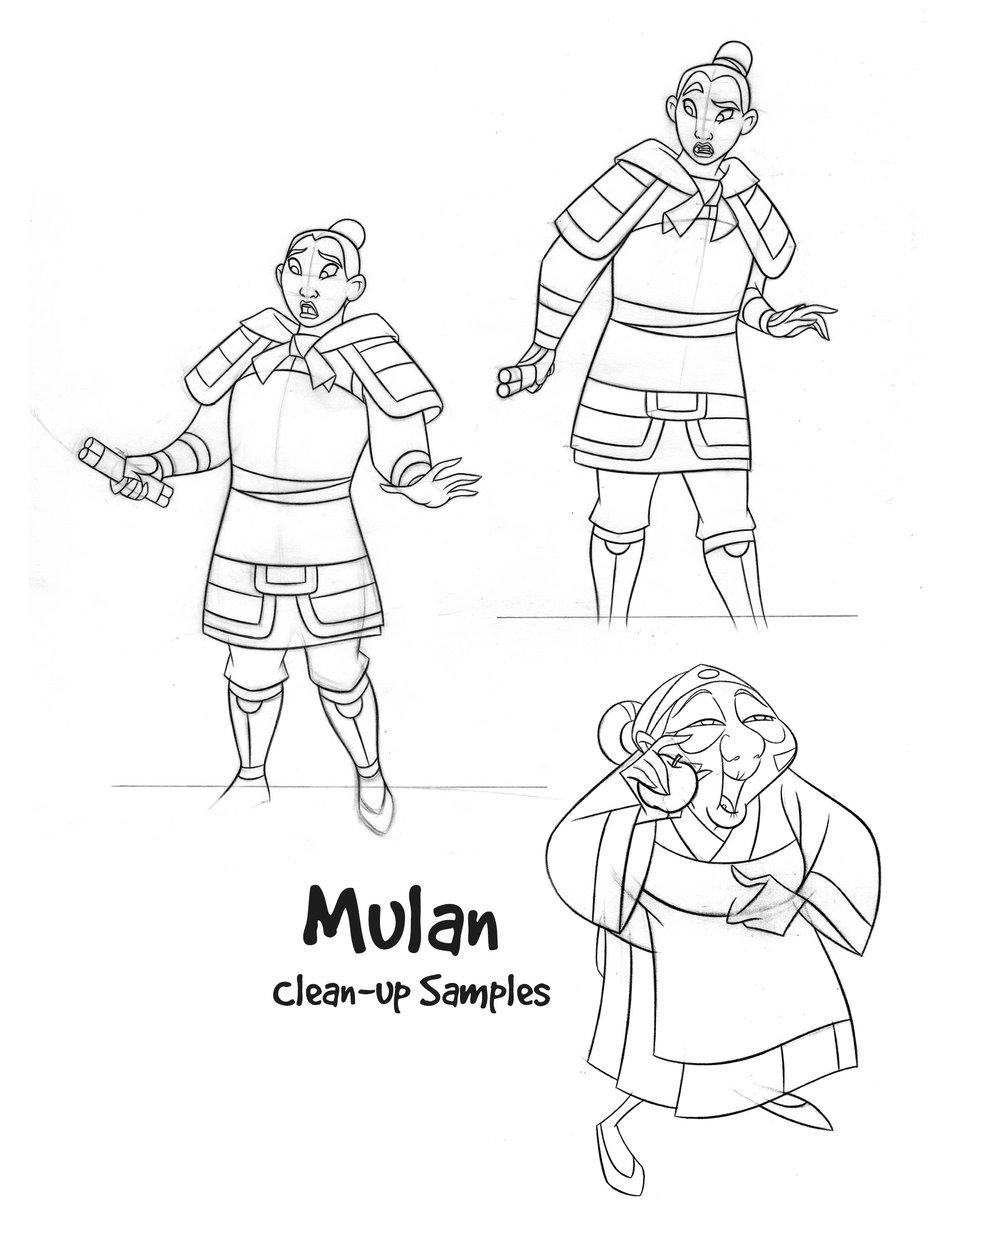 Mulan Cleanup Samples2.jpg